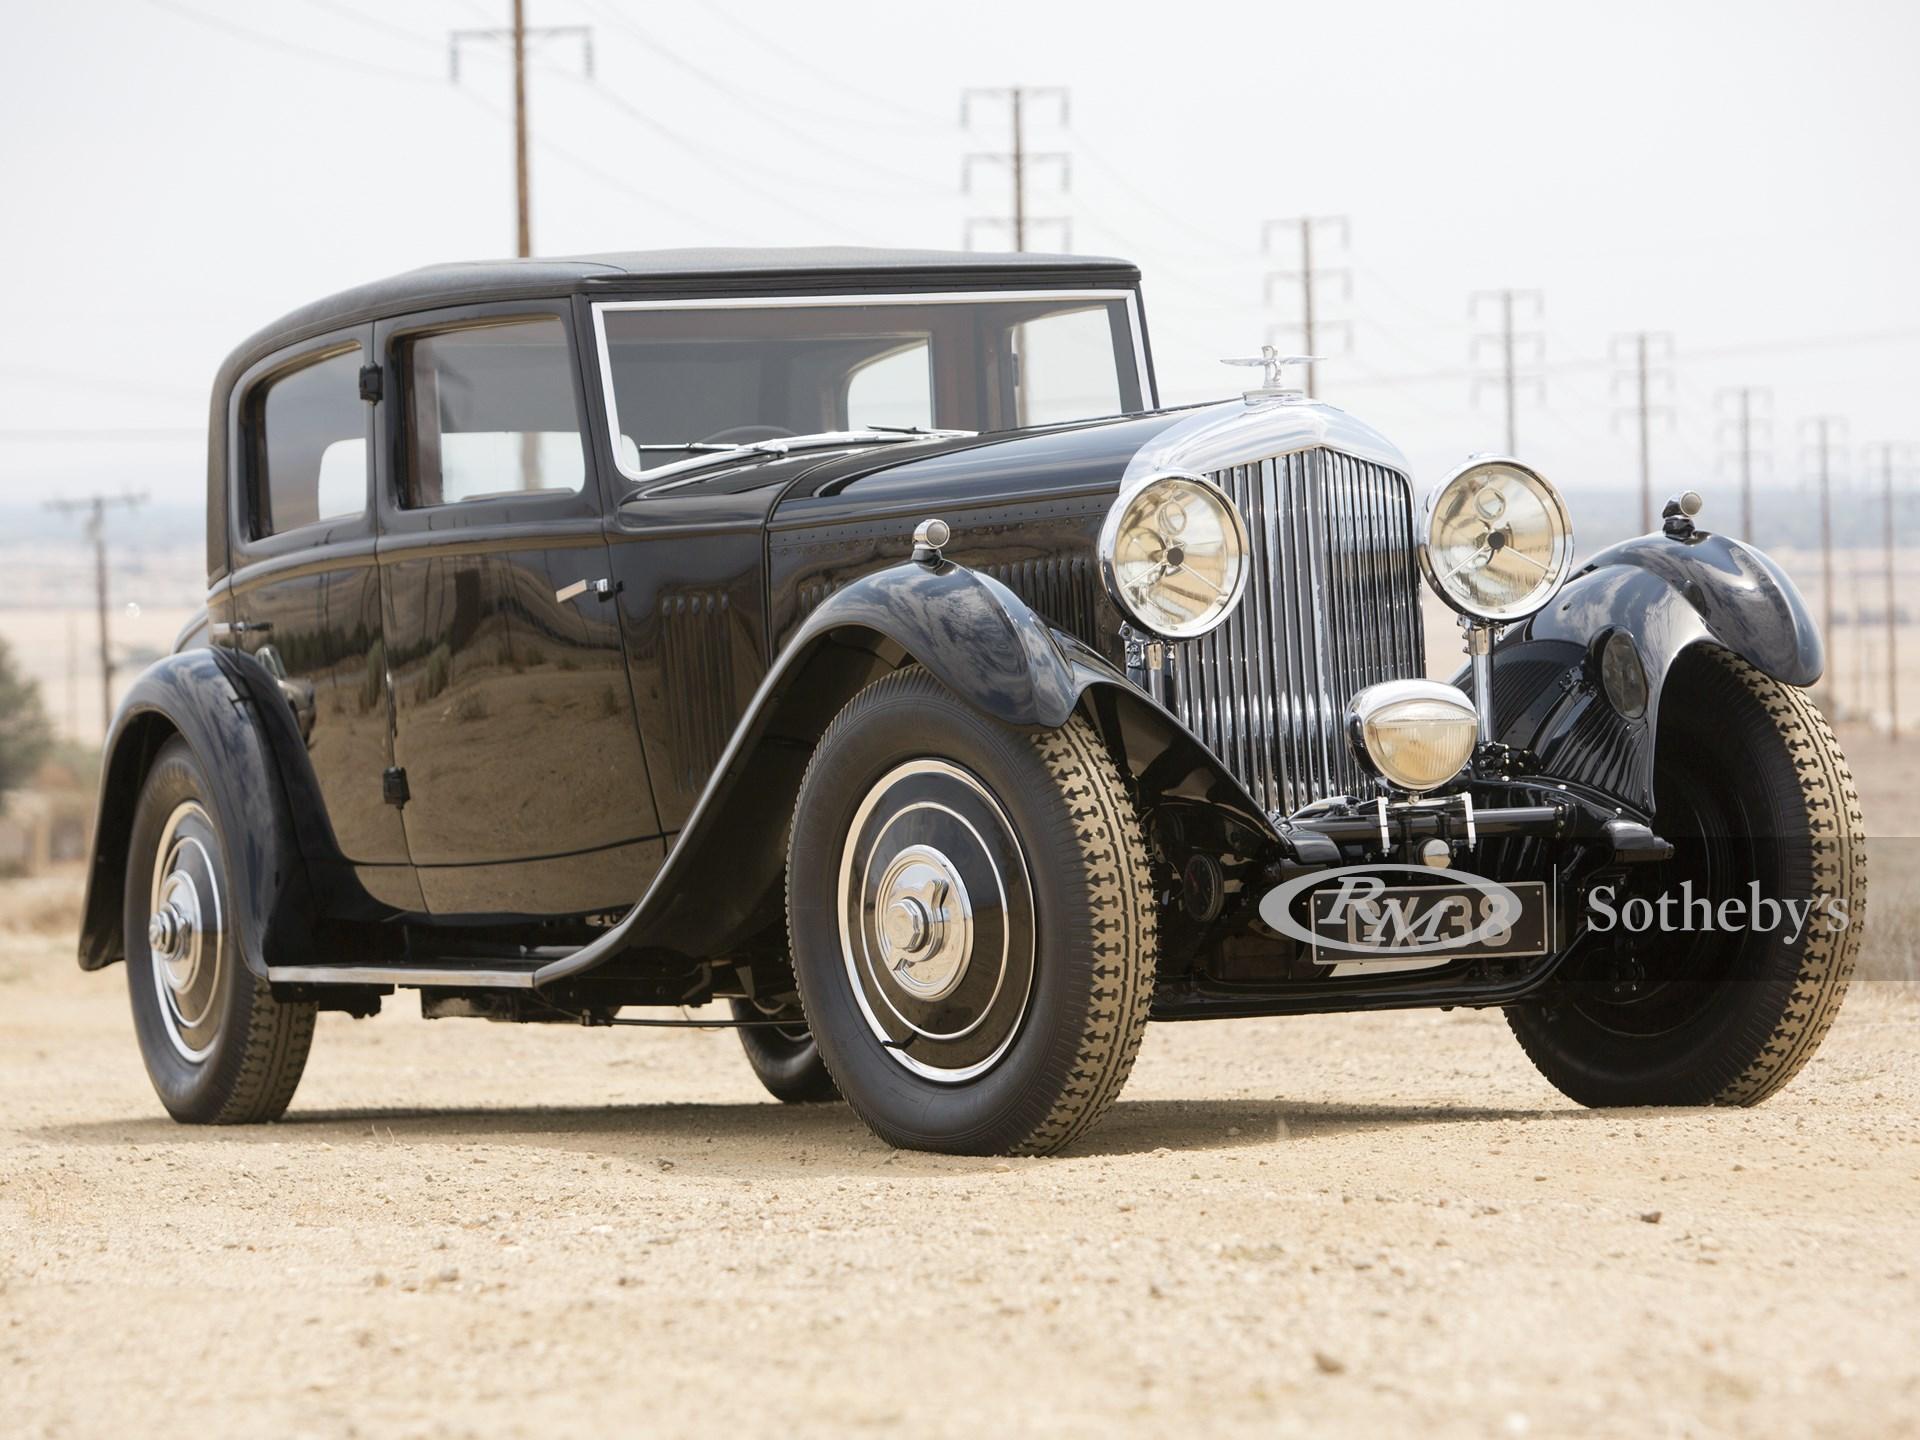 1932 Bentley 8-Litre Saloon by Arthur Mulliner